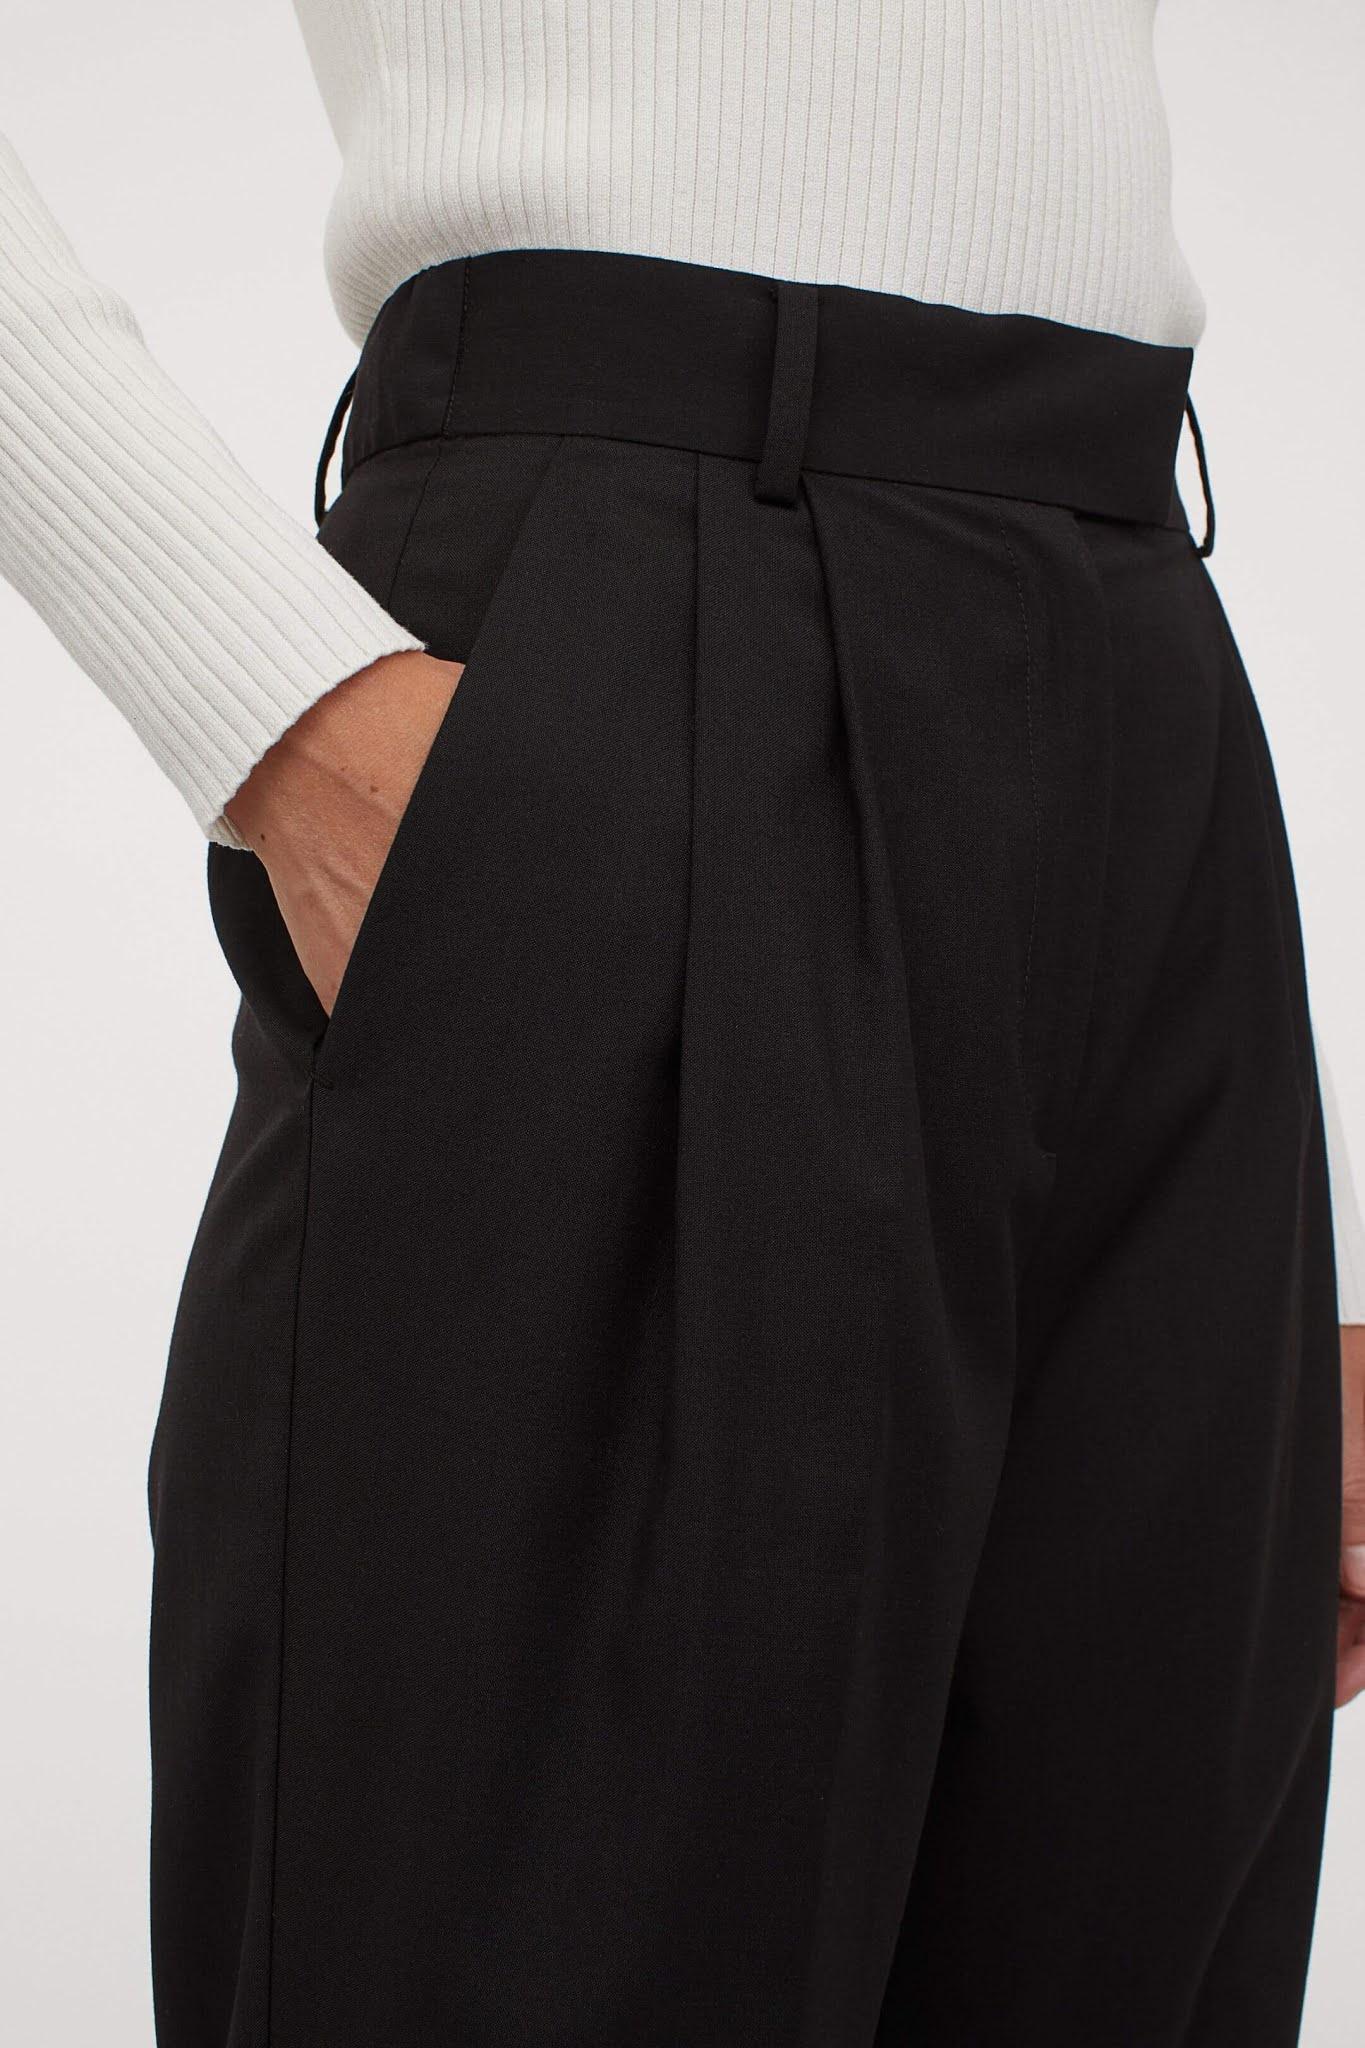 black creased pants